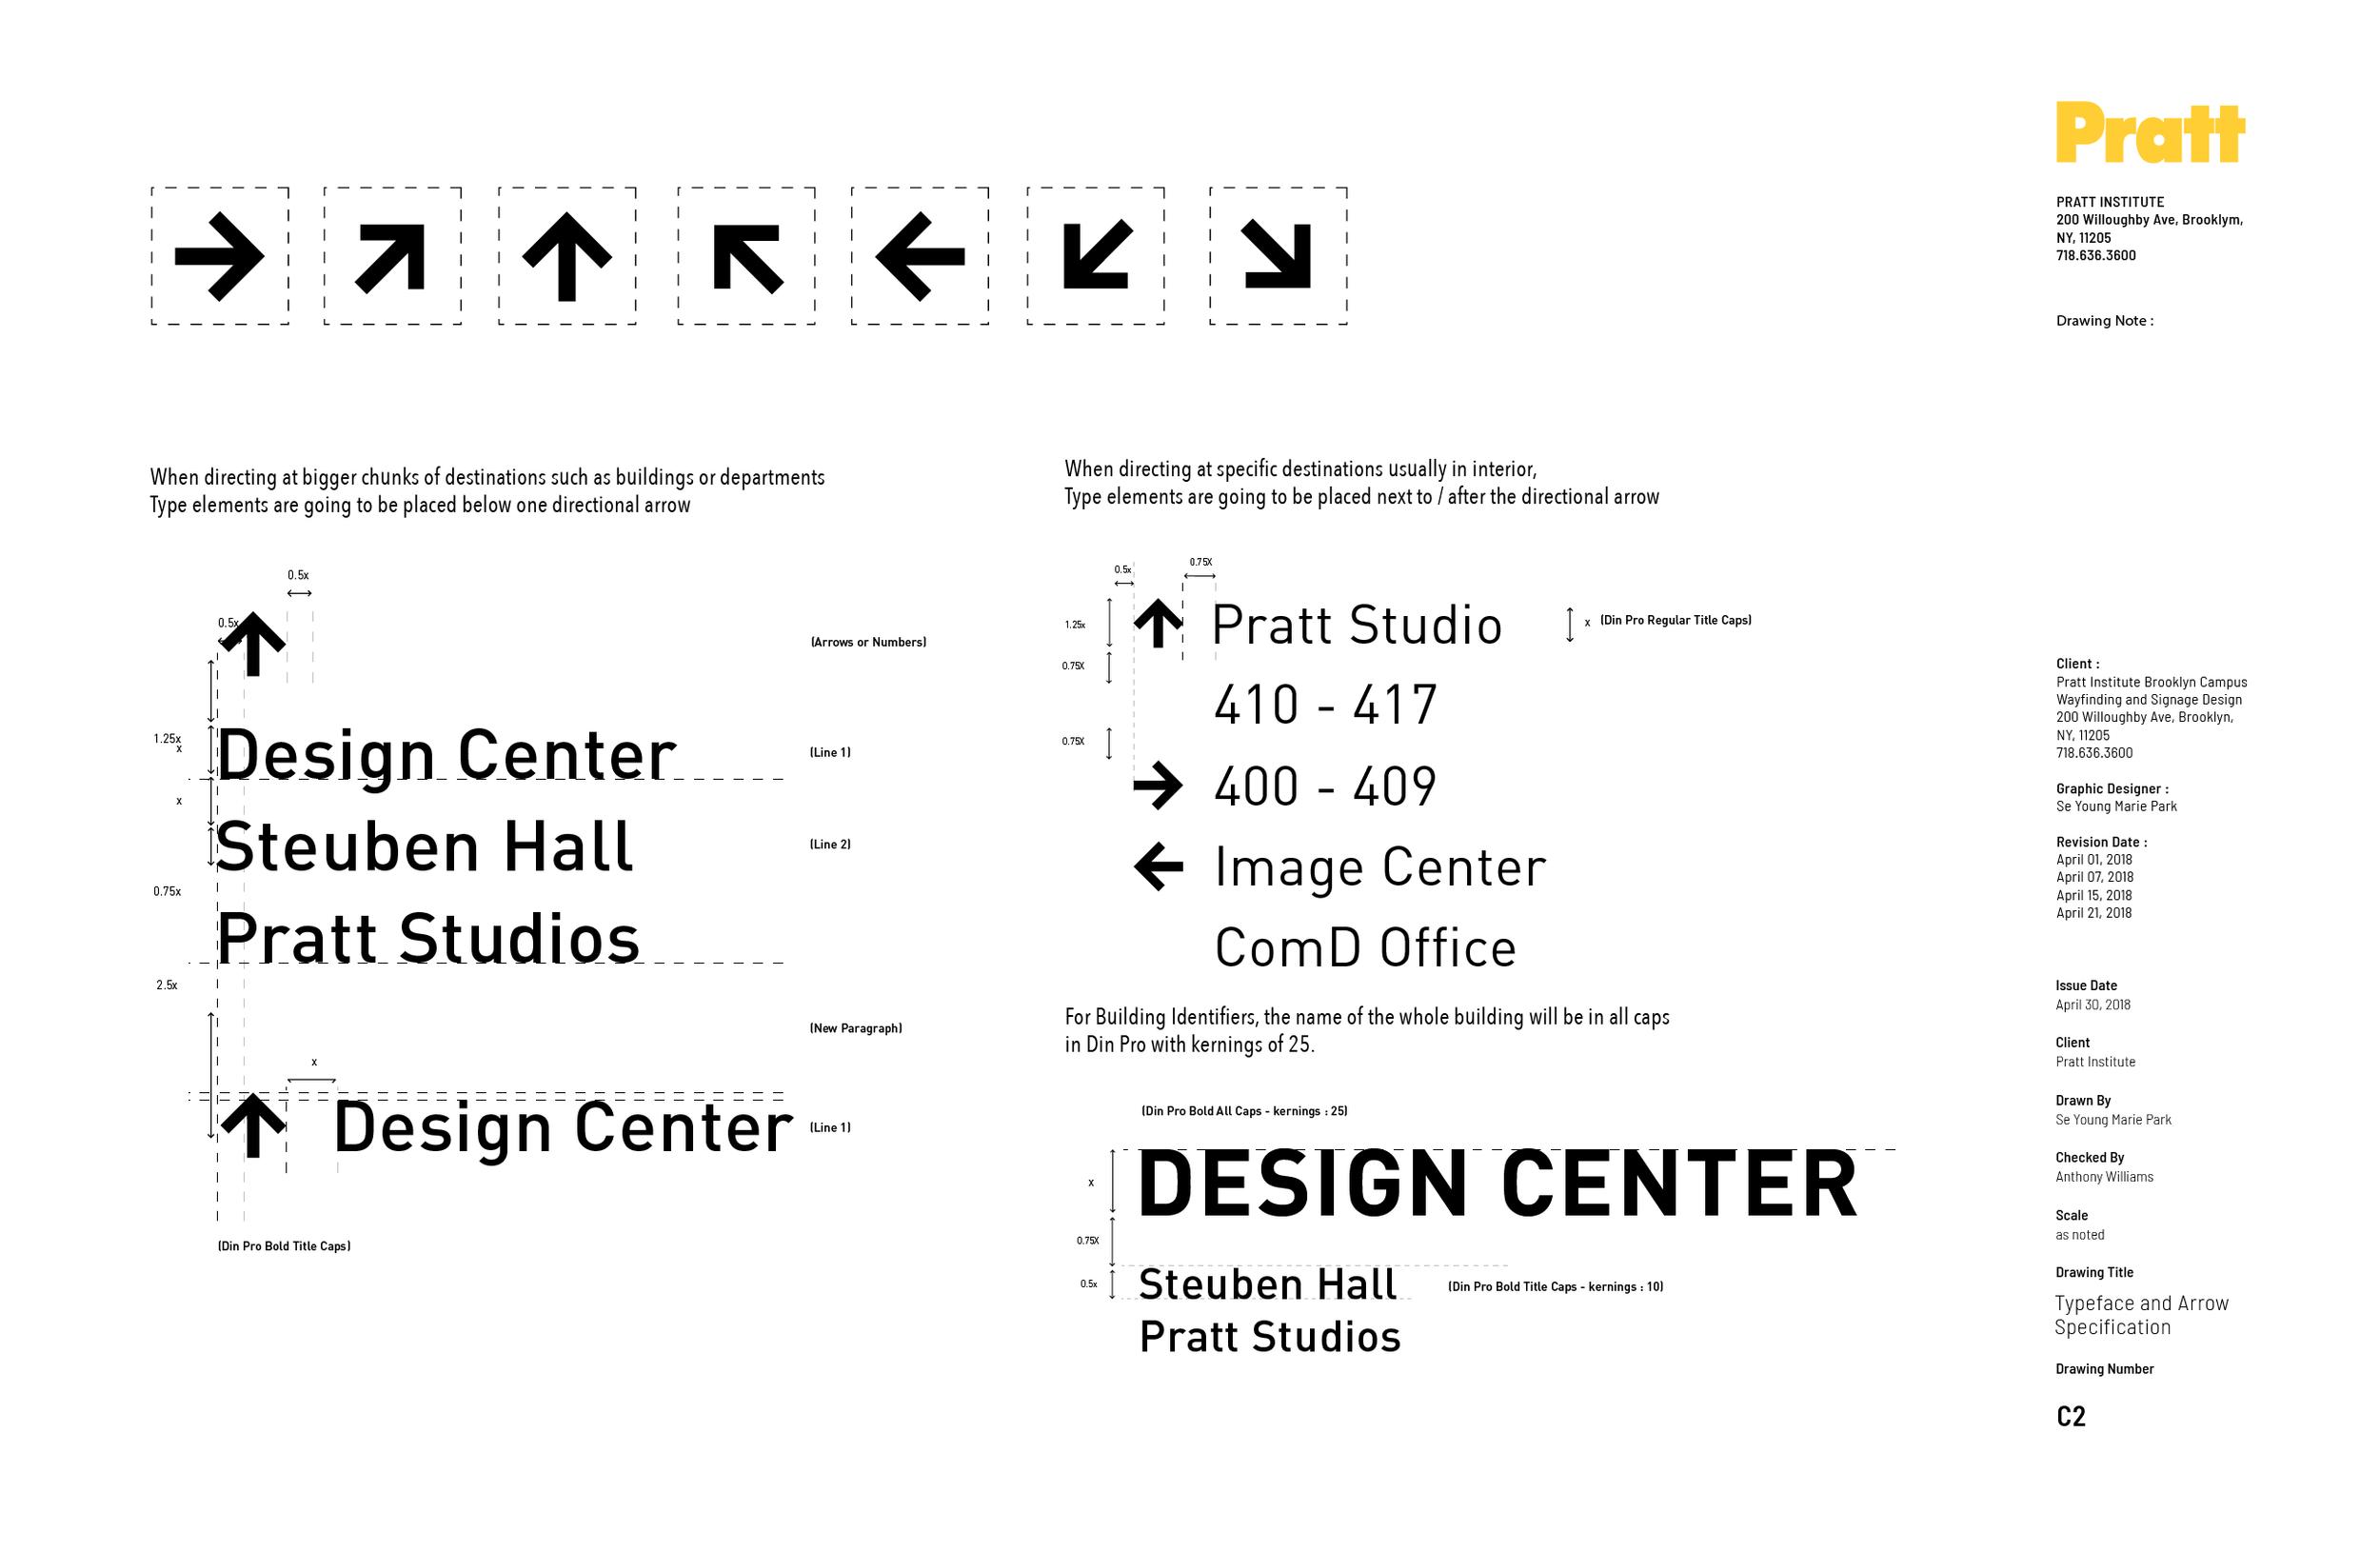 Pratt_Wayfinding_Signage_Design-14.png